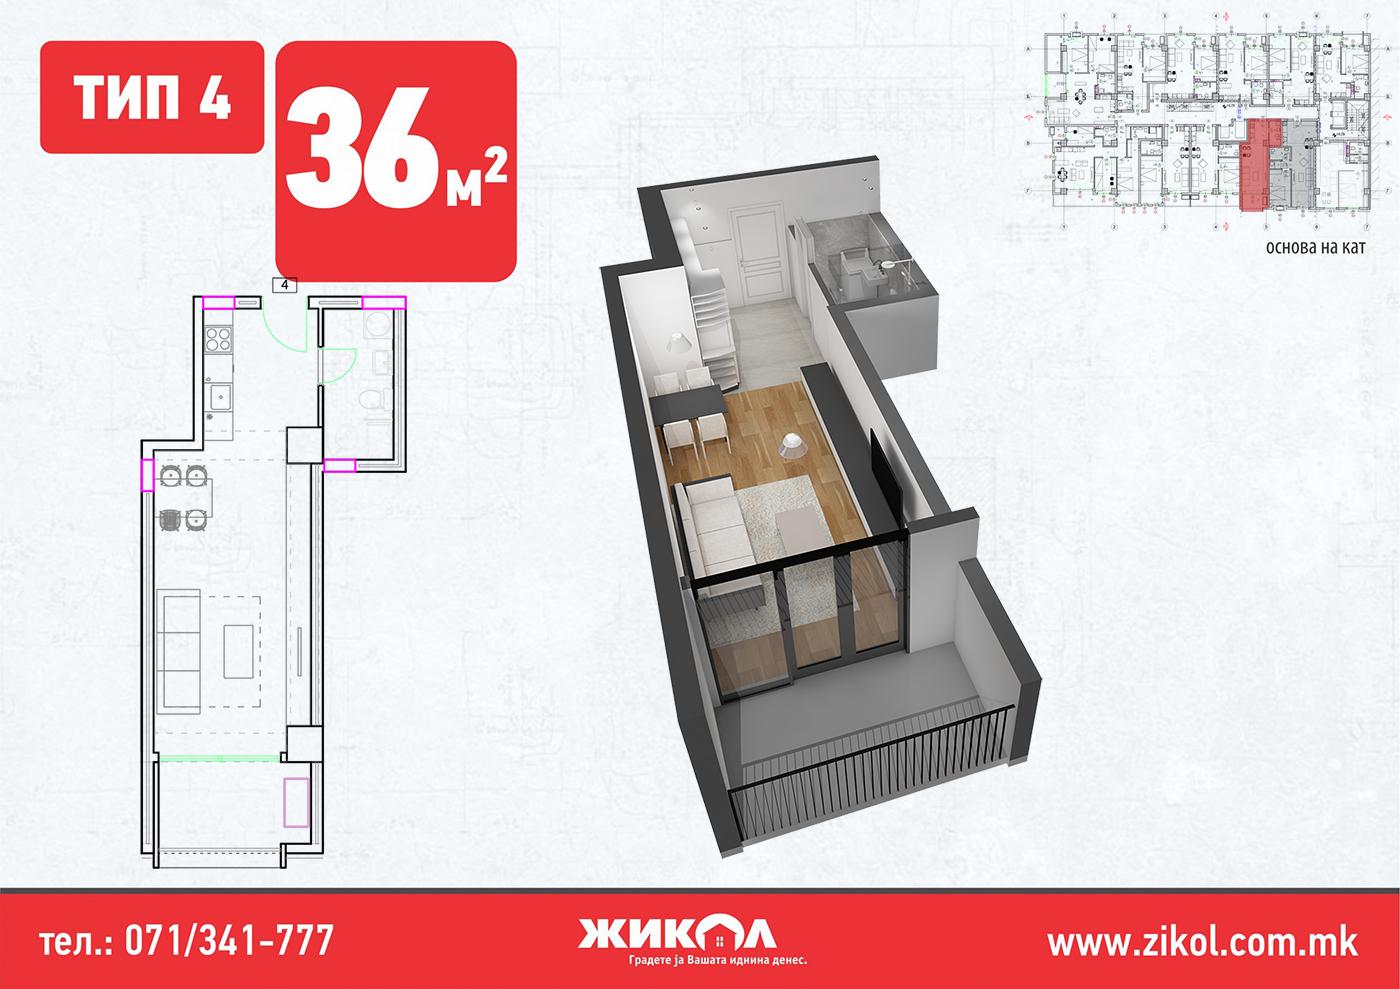 Зграда 55, кат 2, стан 14